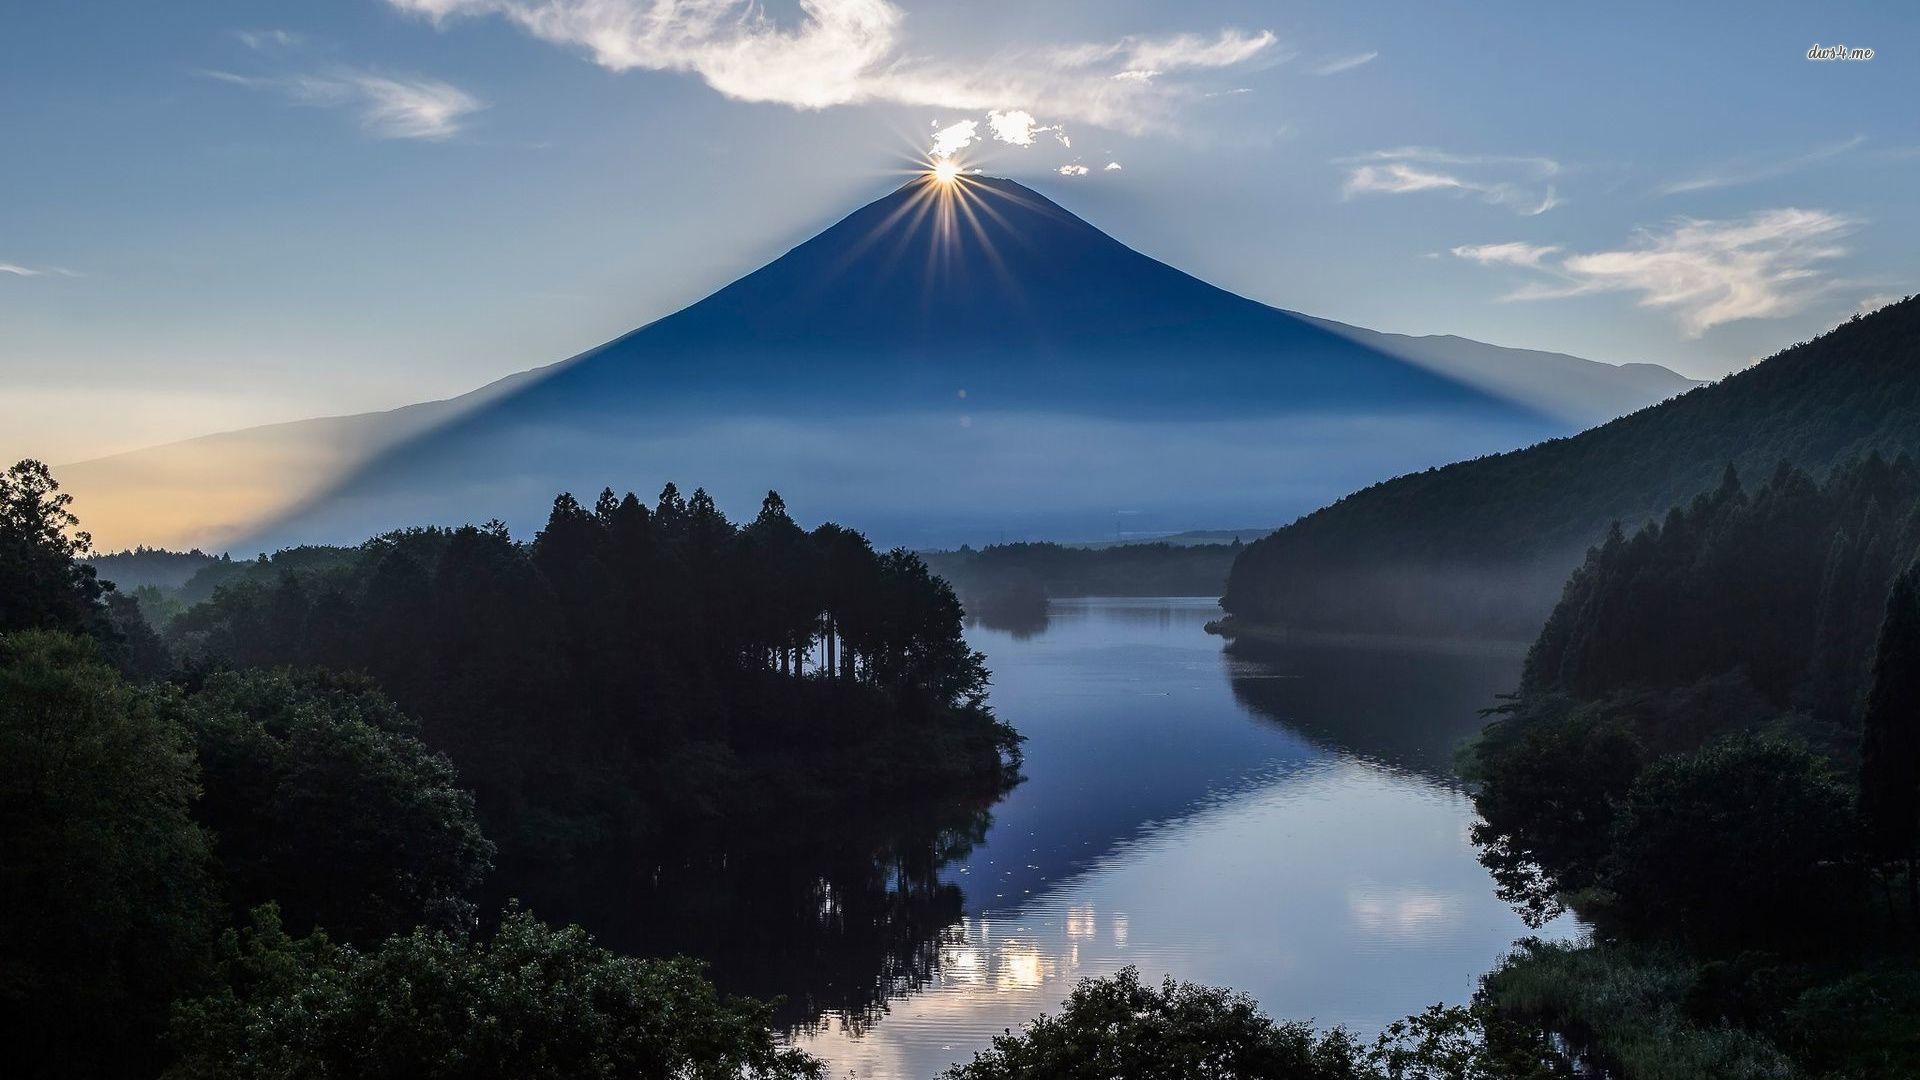 Sun Resting On Top Of Mount Fuji Wallpaper - Mount Fuji , HD Wallpaper & Backgrounds